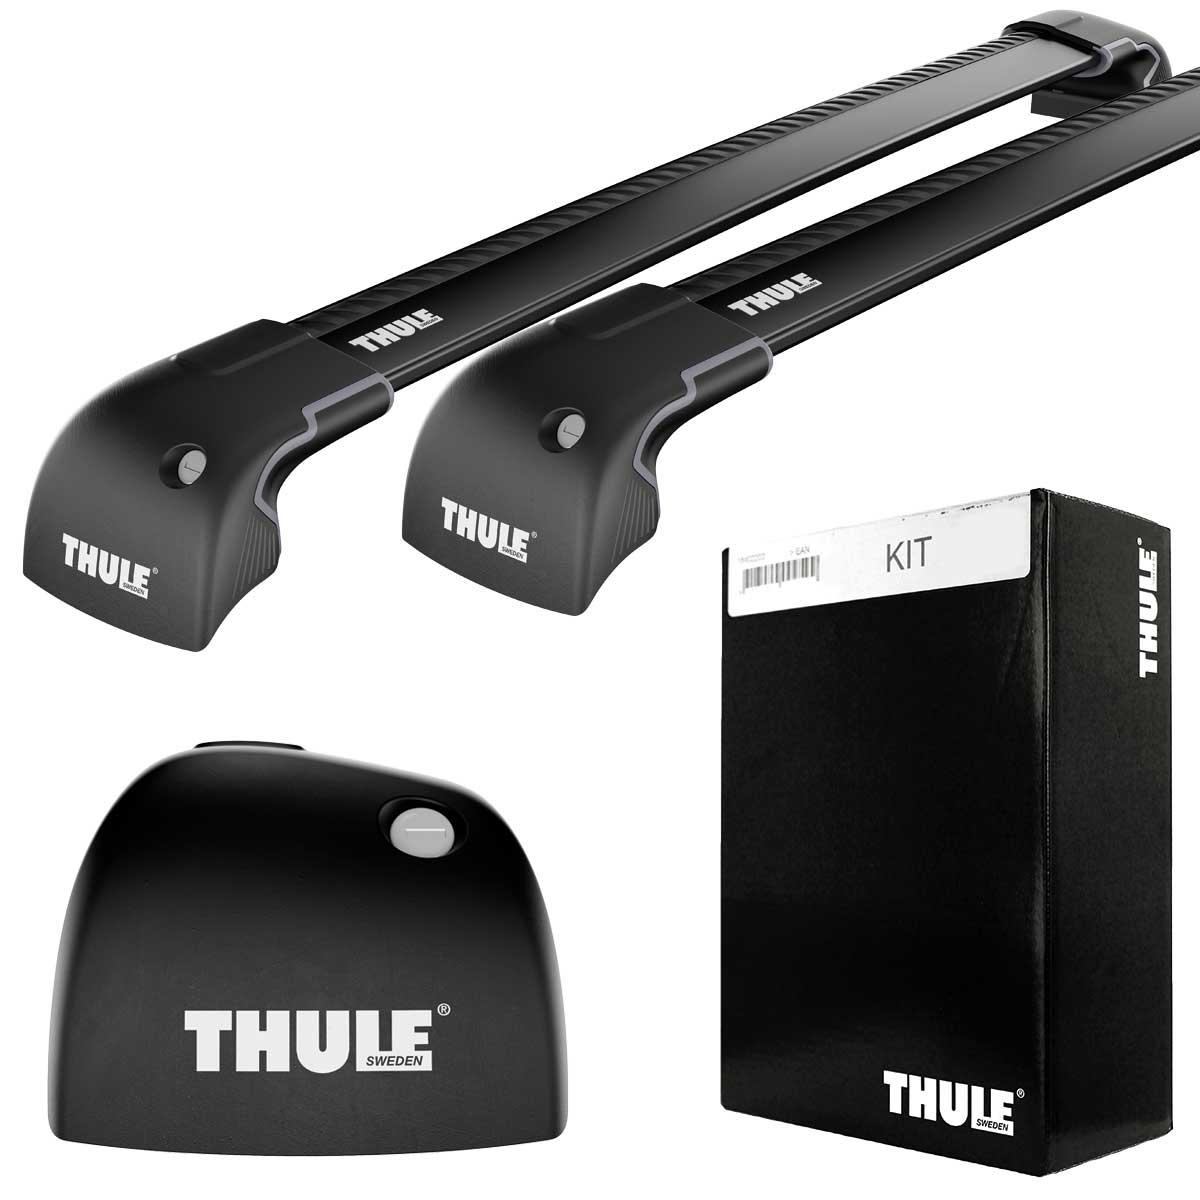 Volvo - Thule WingBar Edge Black 9592 + Kit 4073